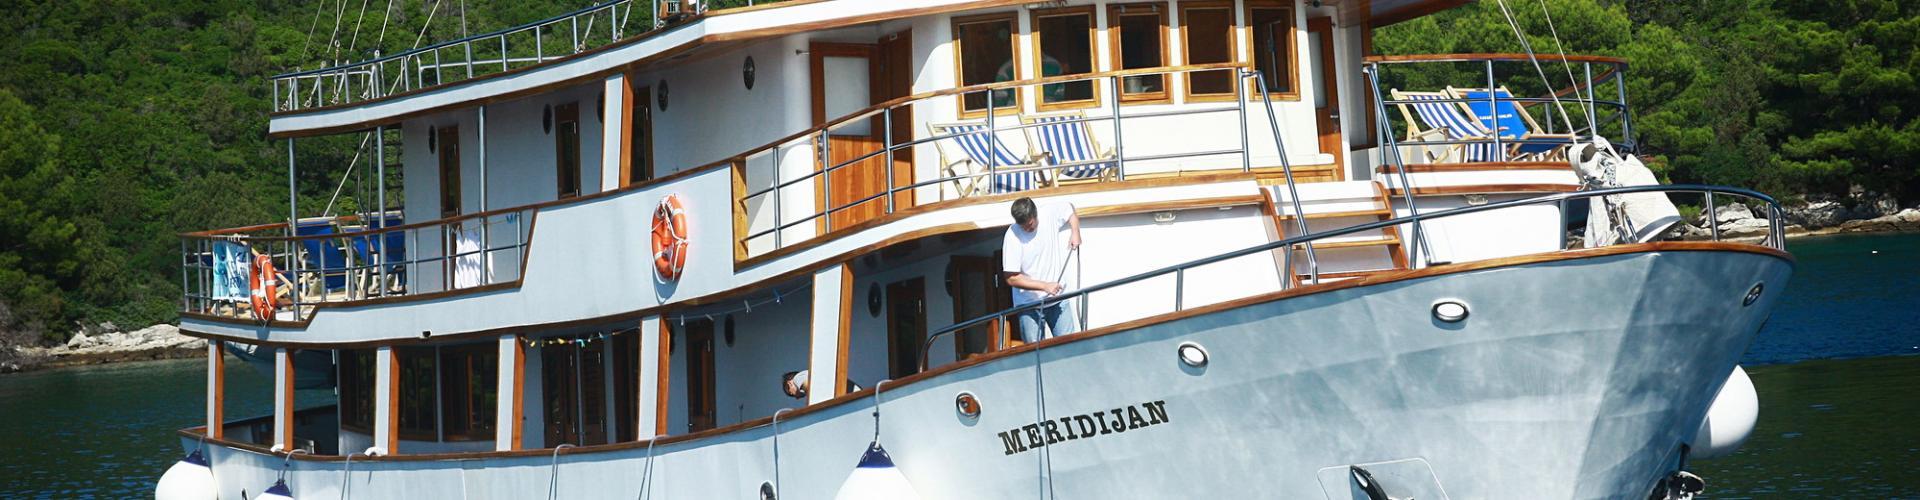 2006. Premium cruiser MV Meridijan